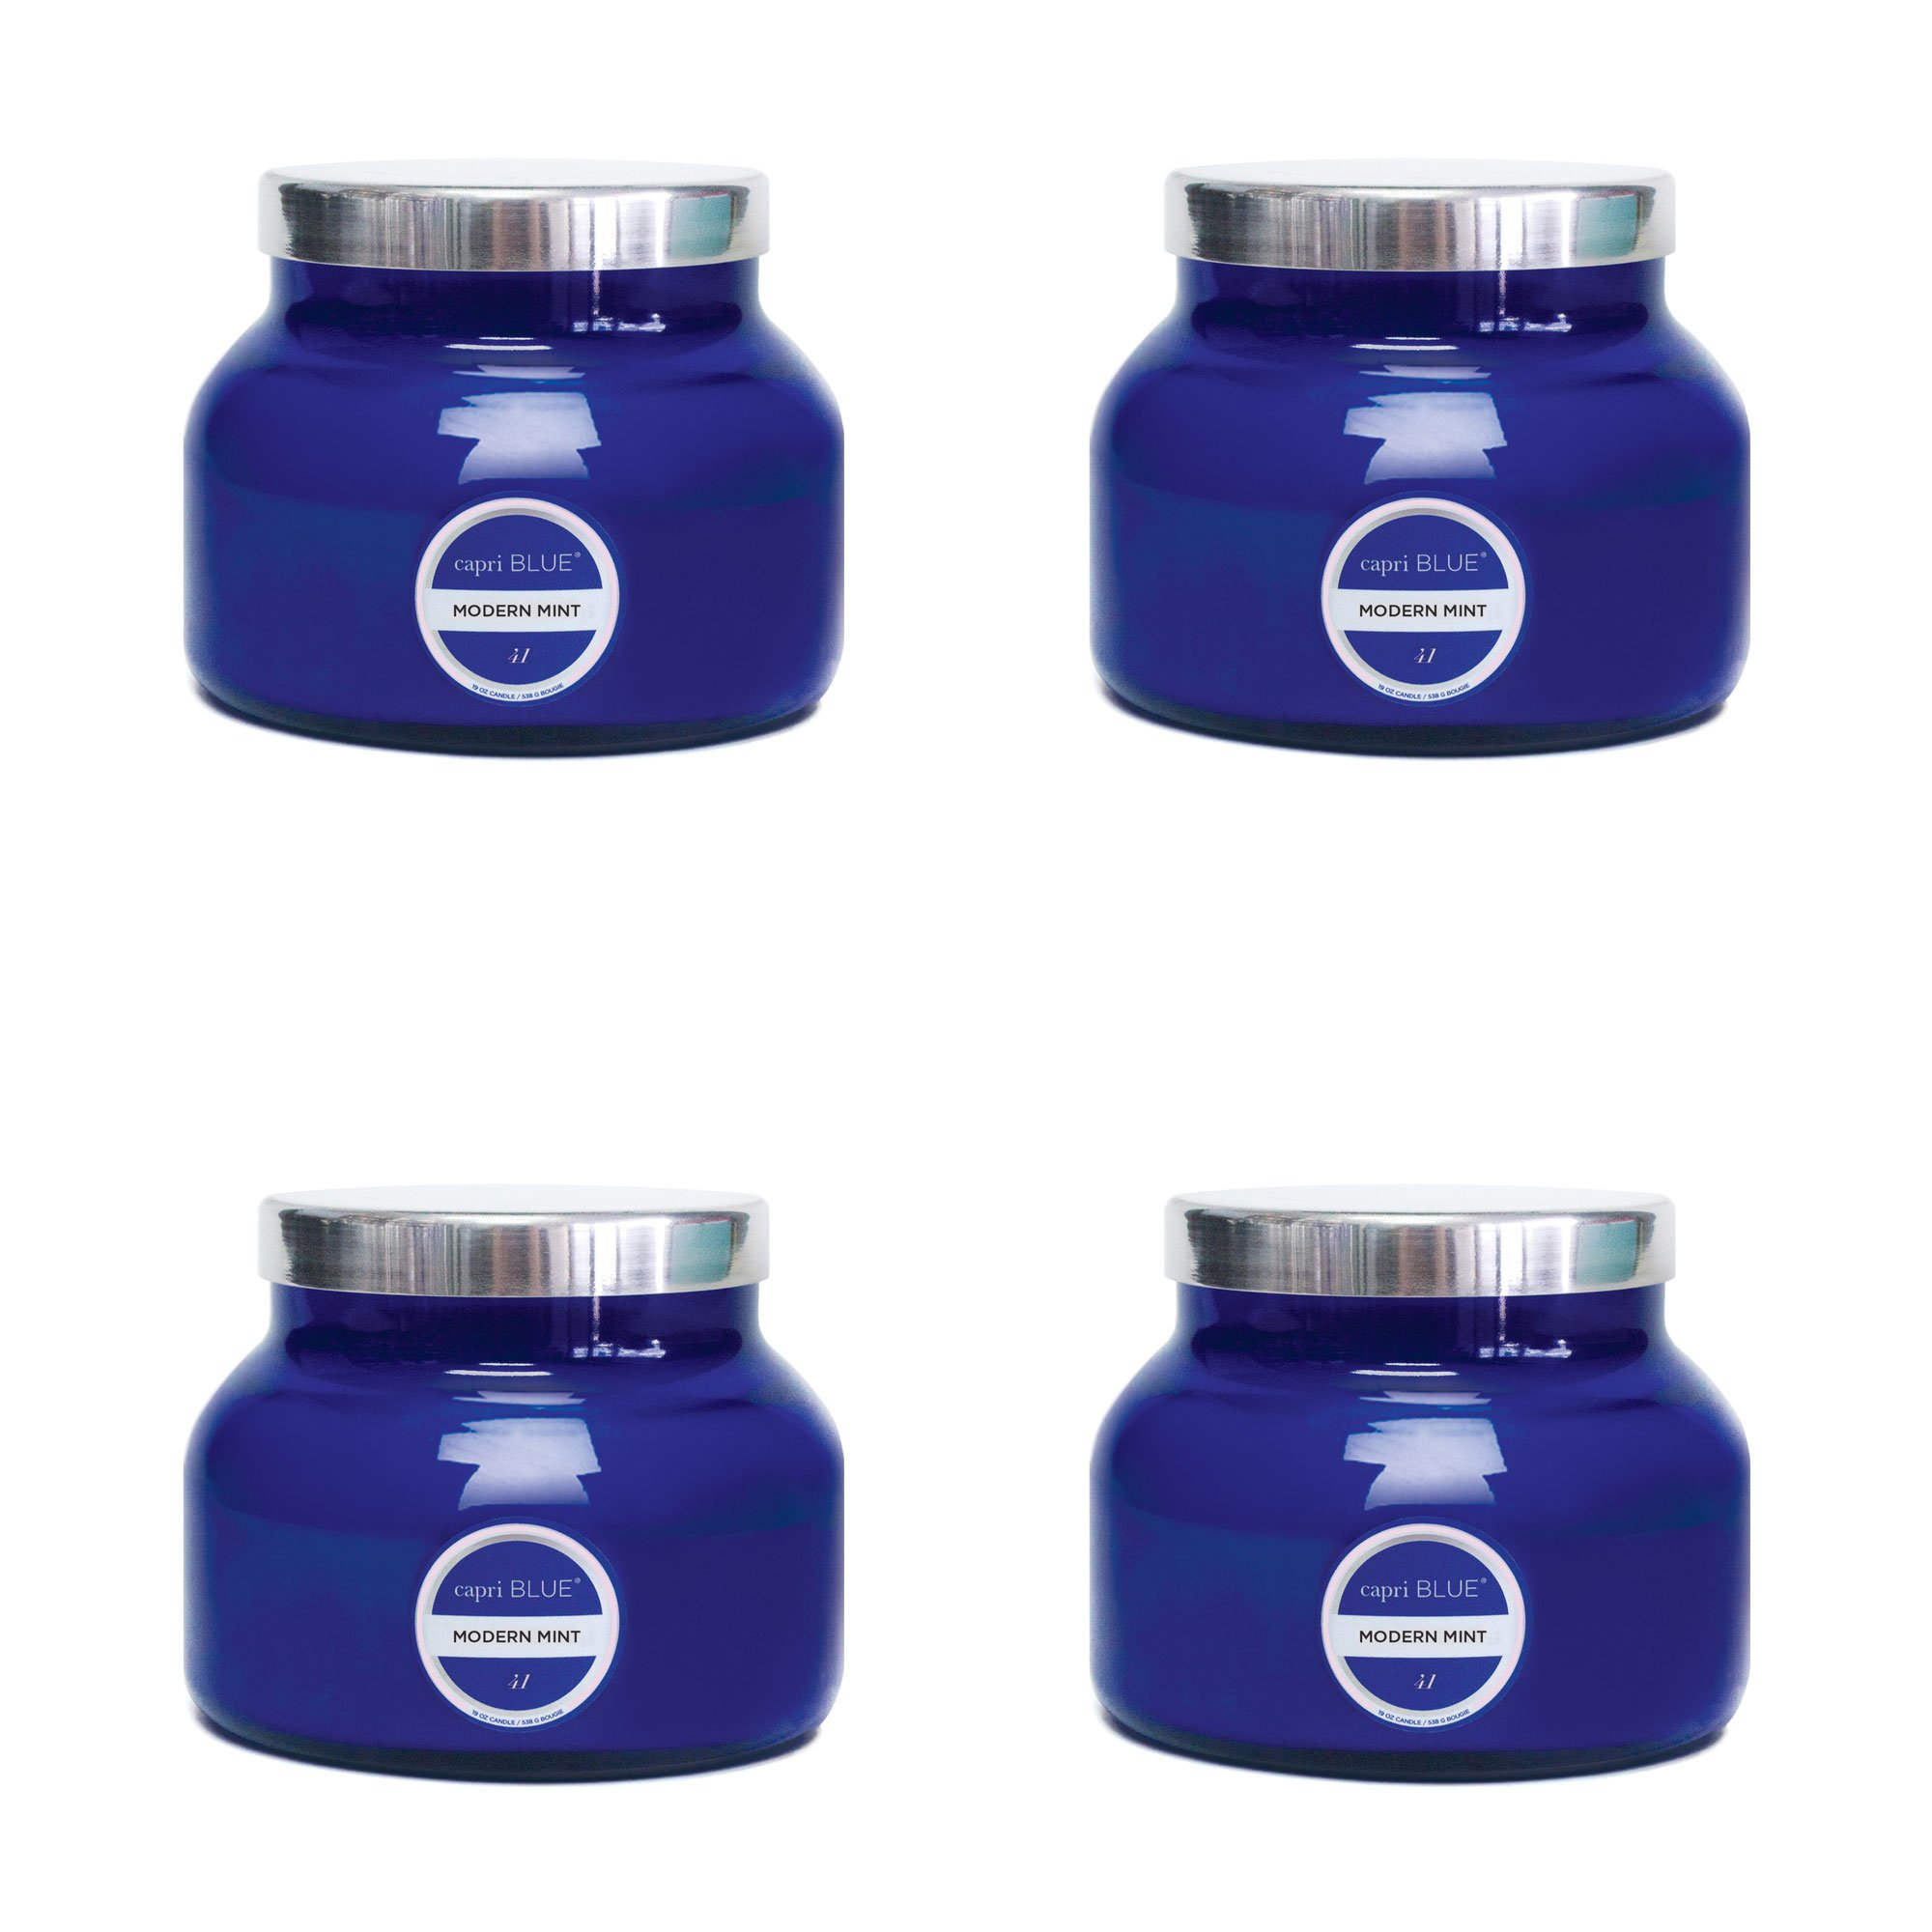 Capri Blue 19 oz Signiture Jar Modern Mint (4pk), Assorted, One Size by Capri Blue